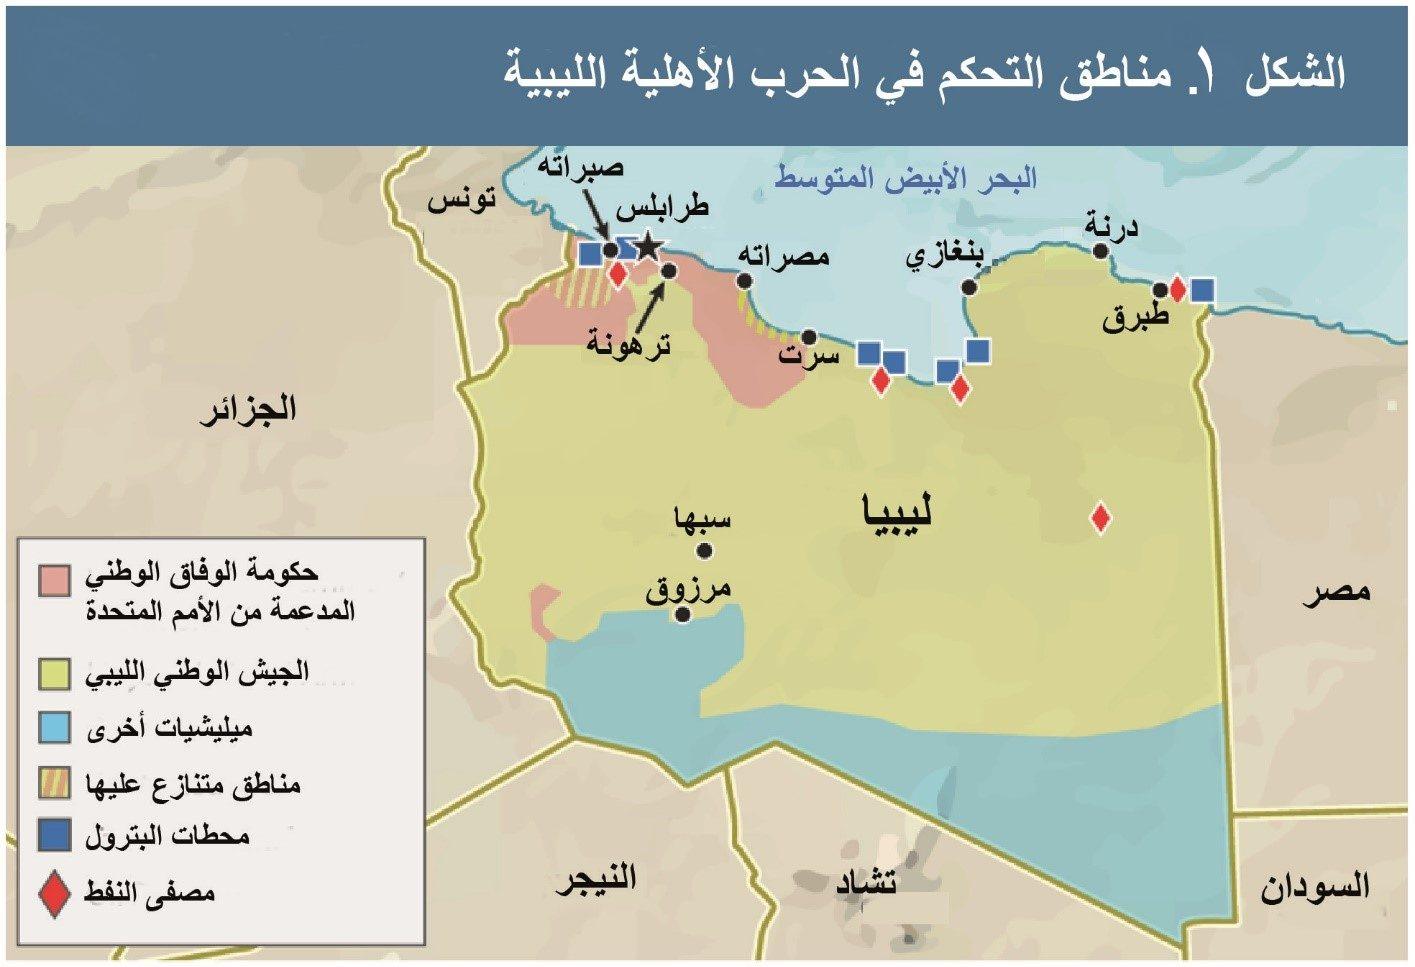 Figure 1 - Figure 1 - Areas of Control in Libya's Civil War